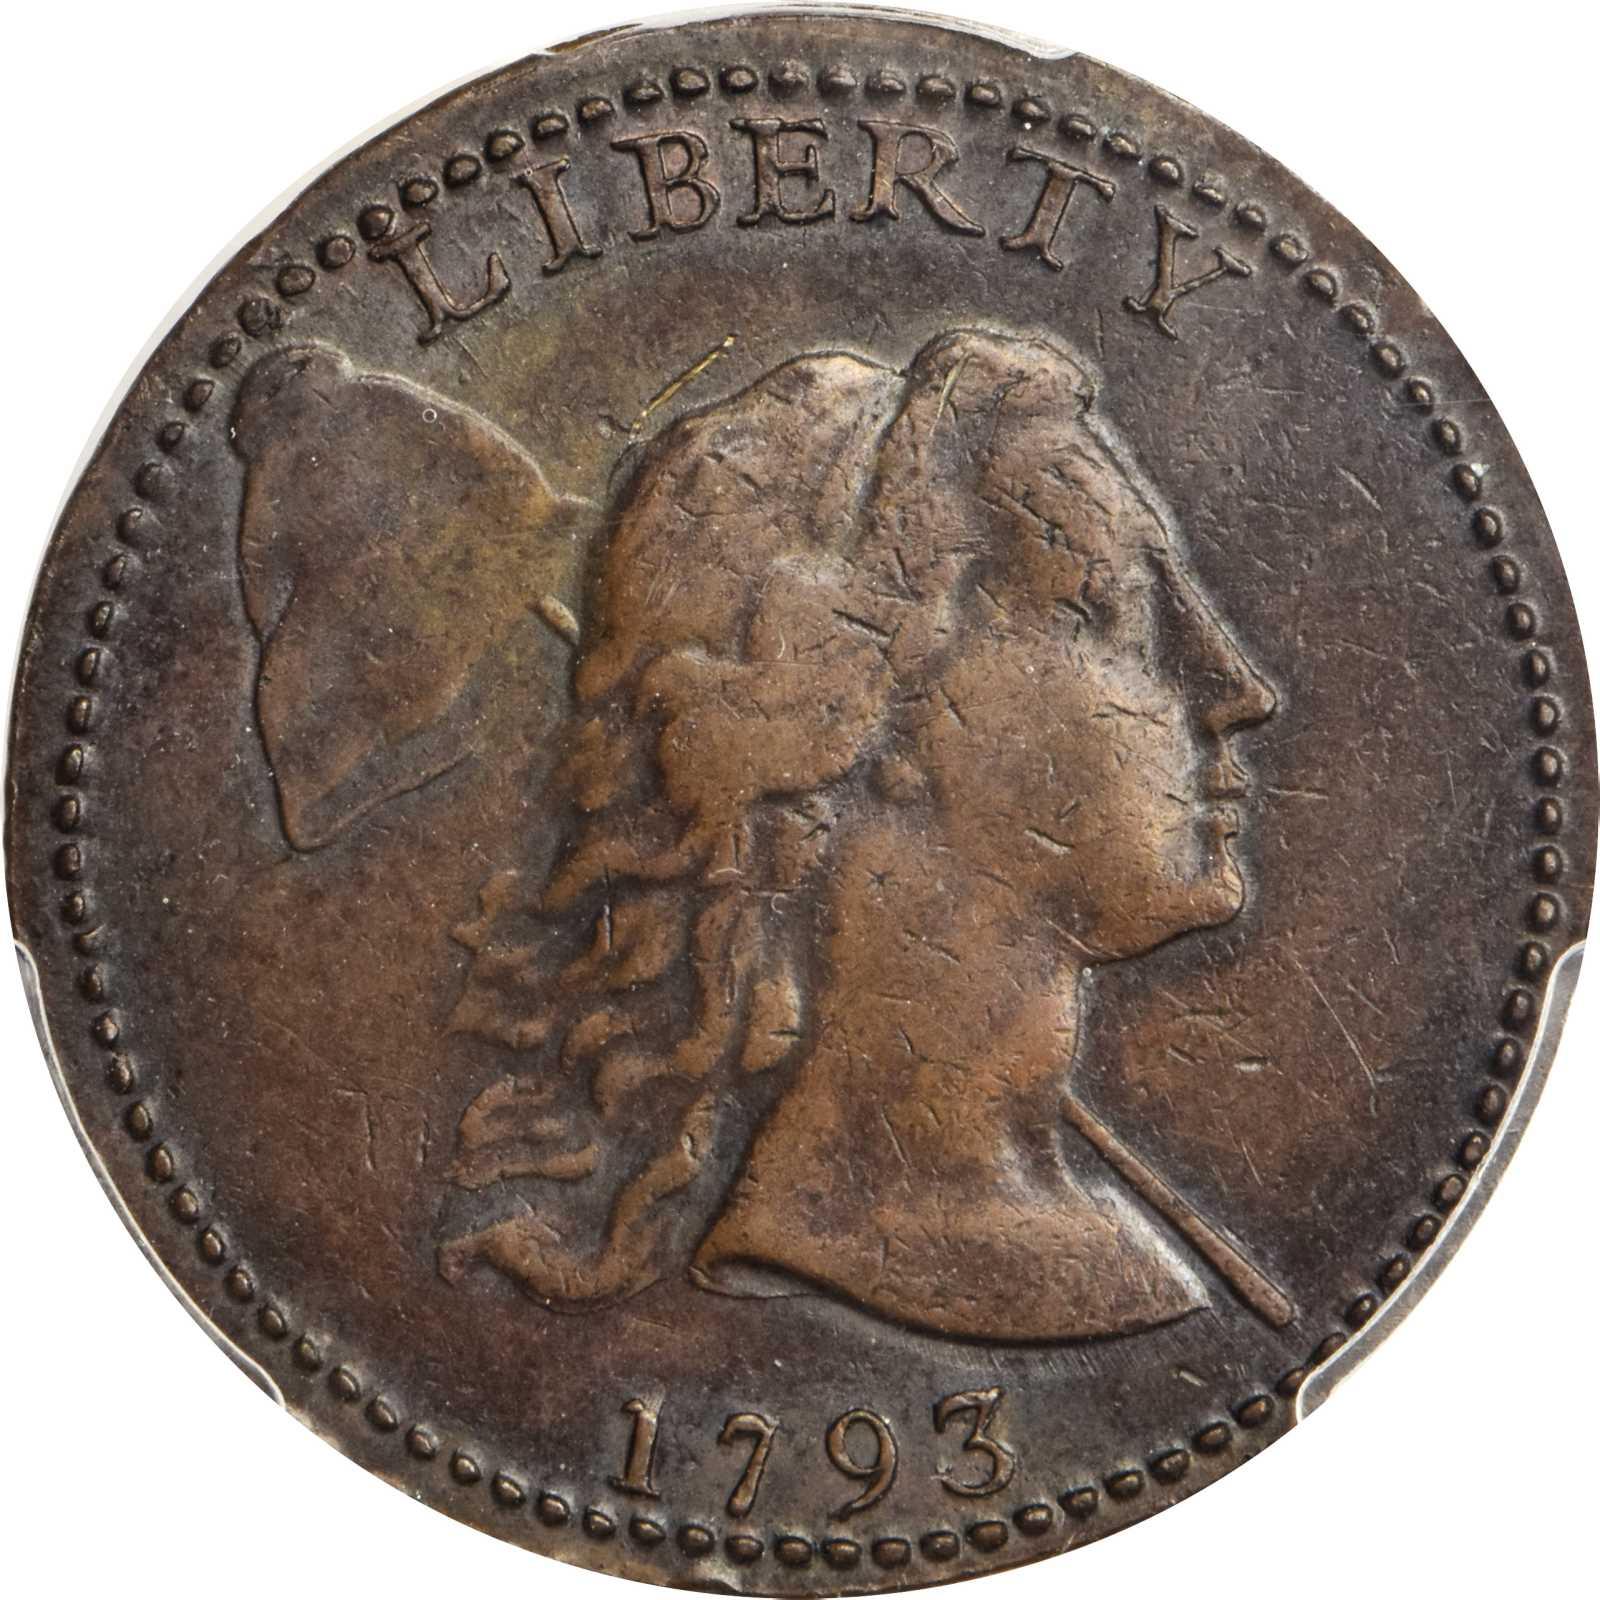 sample image for 1793 Liberty Cap BN [Type]